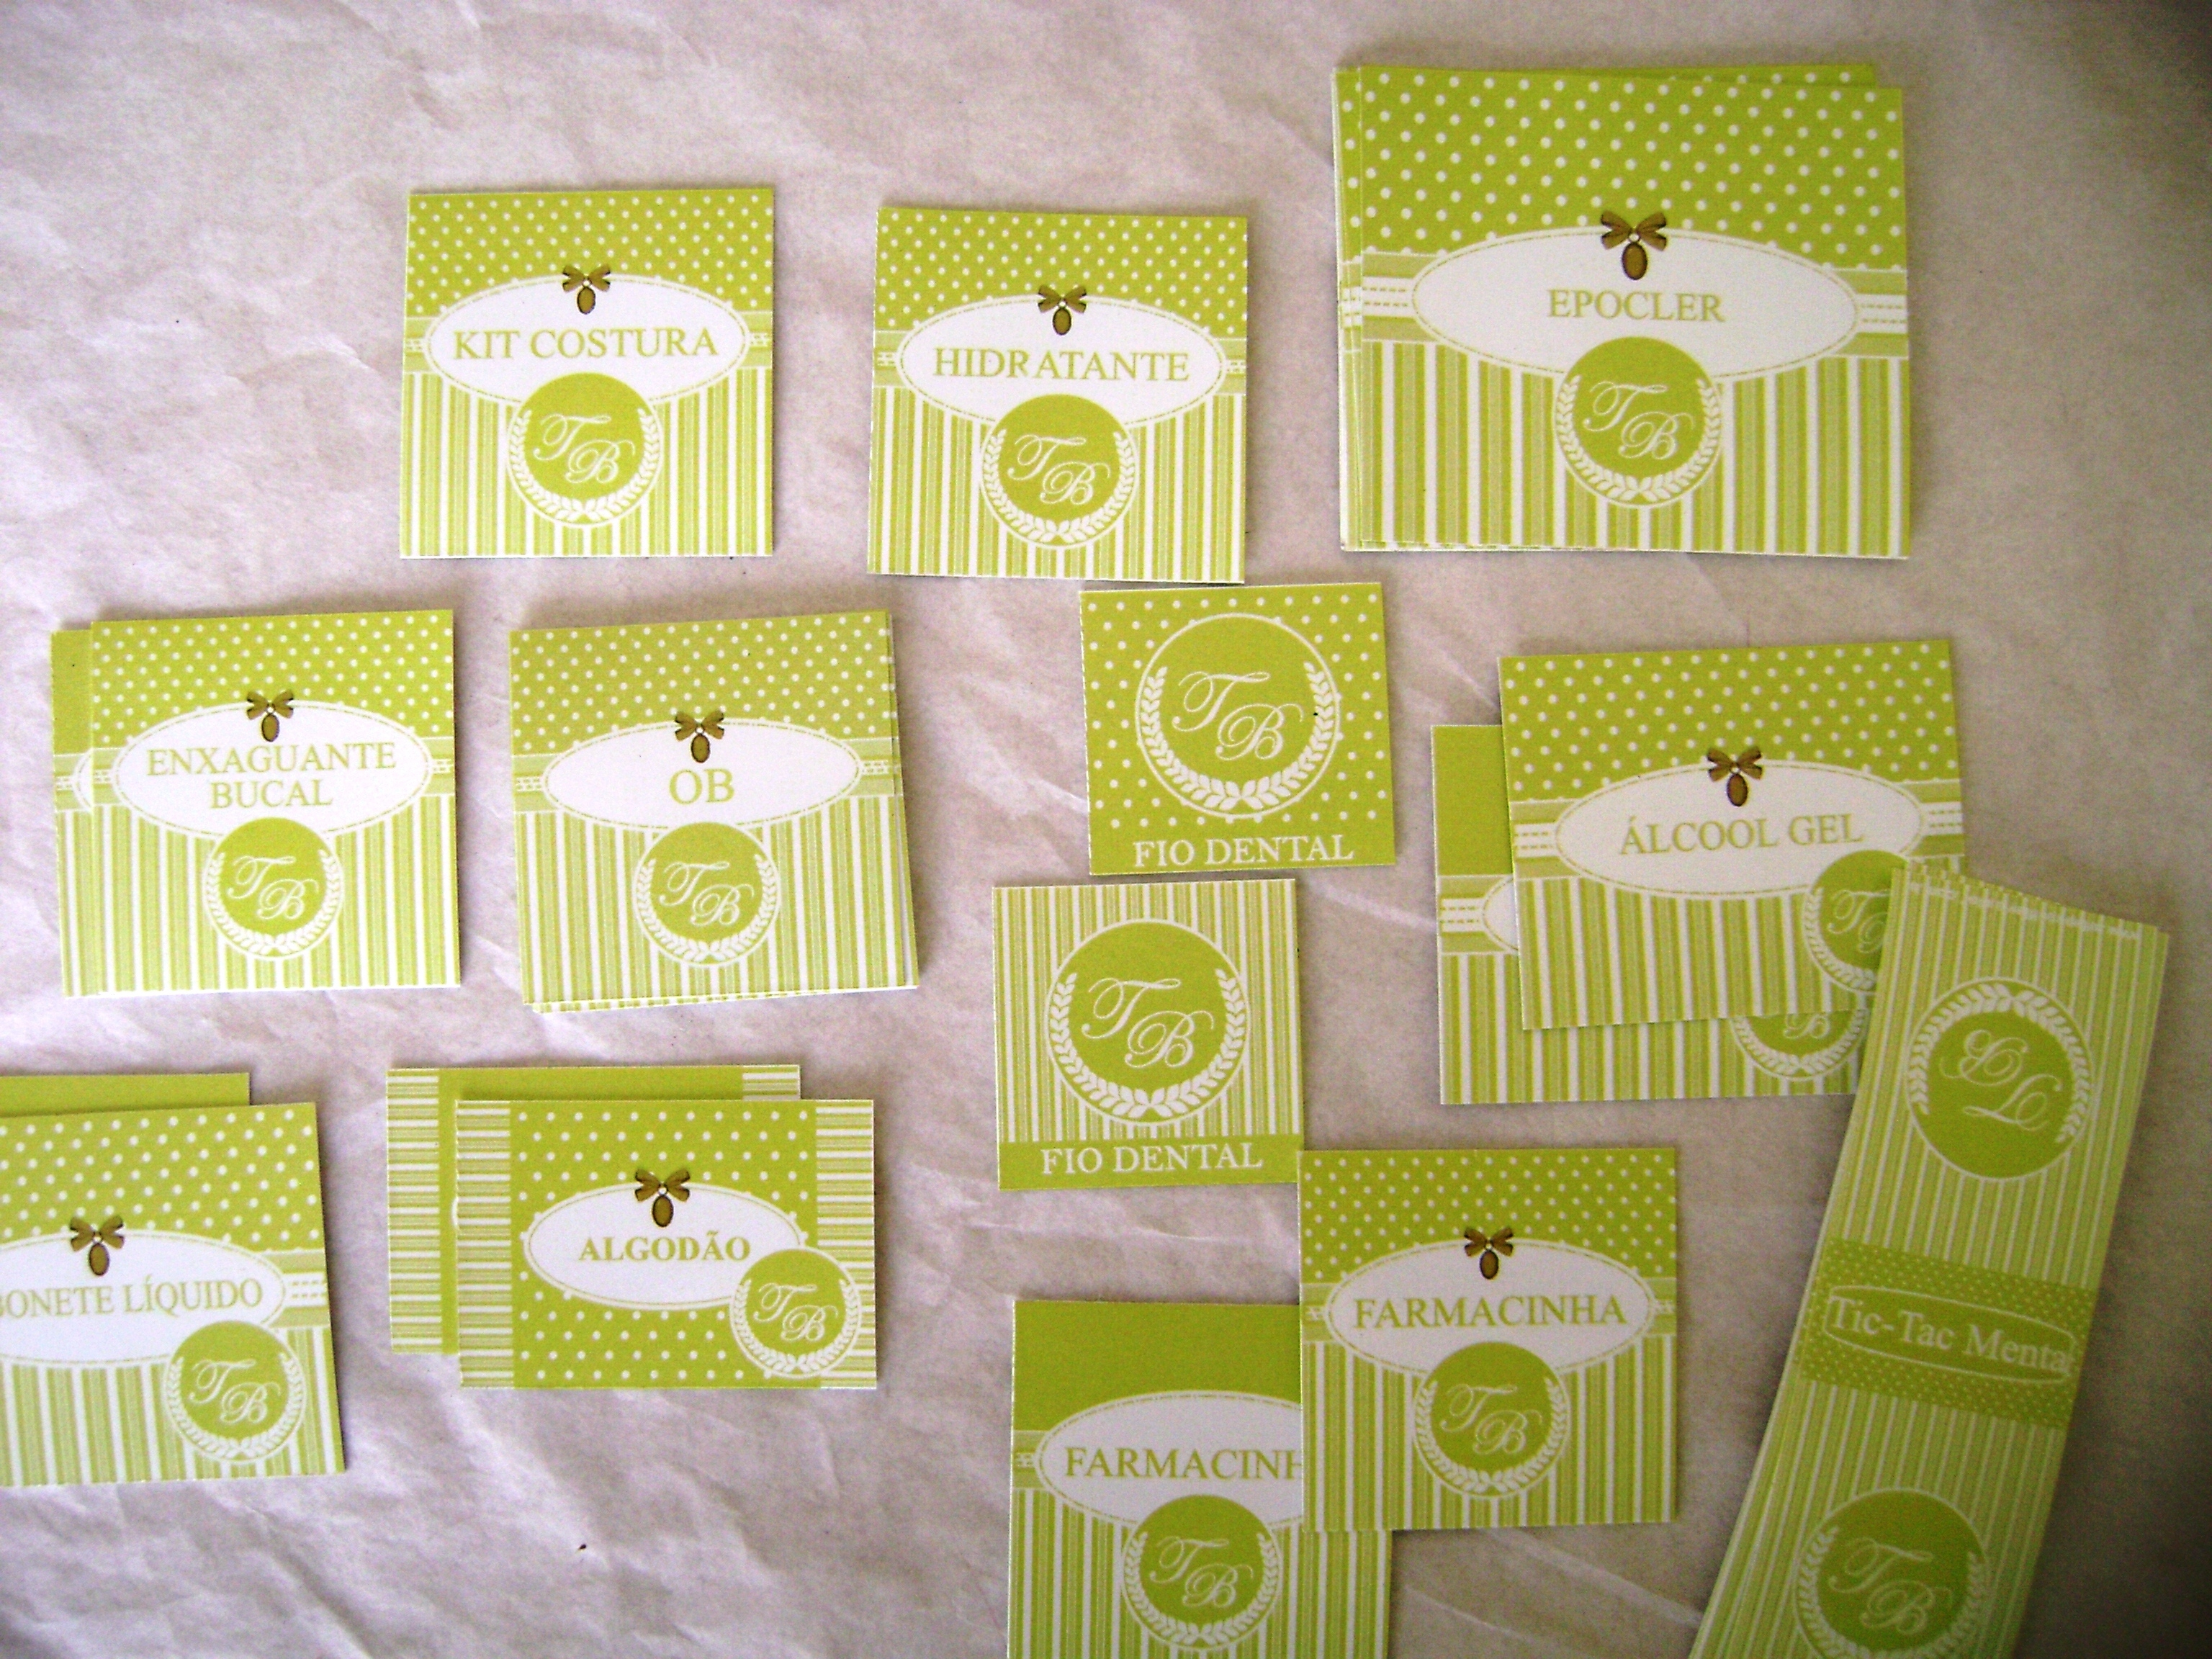 kit decoracao casamento : kit decoracao casamento:kit toilette casamento provencal verde kit toilette casamento